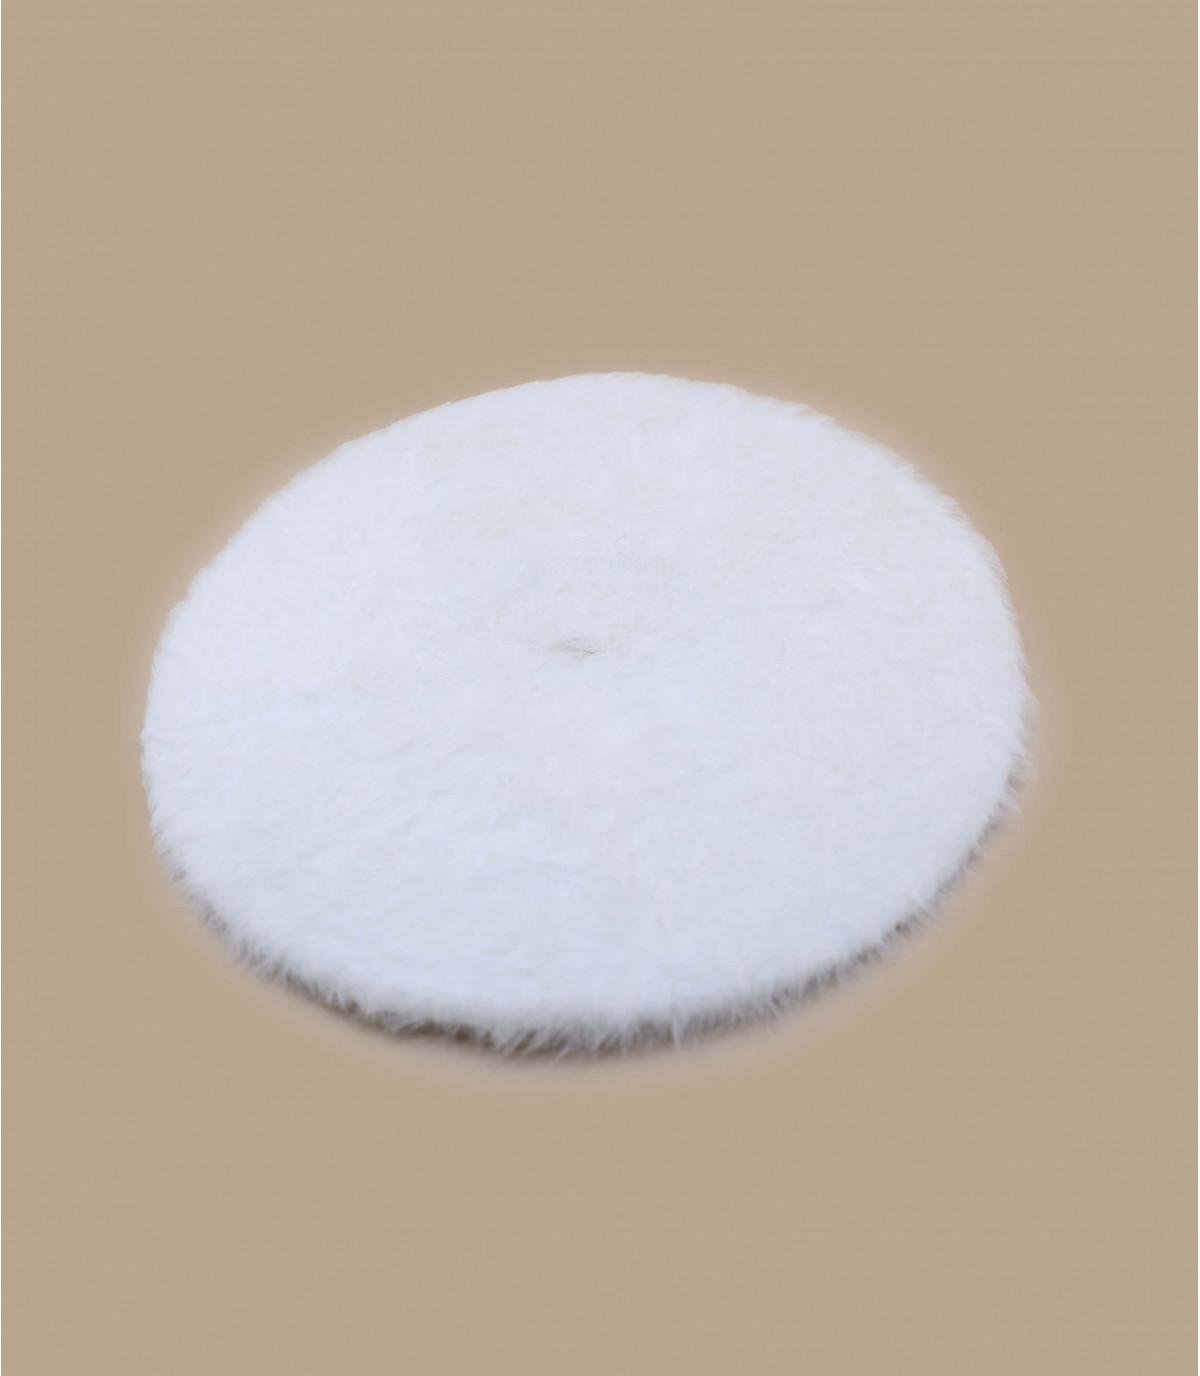 béret angora blanc Laulhère